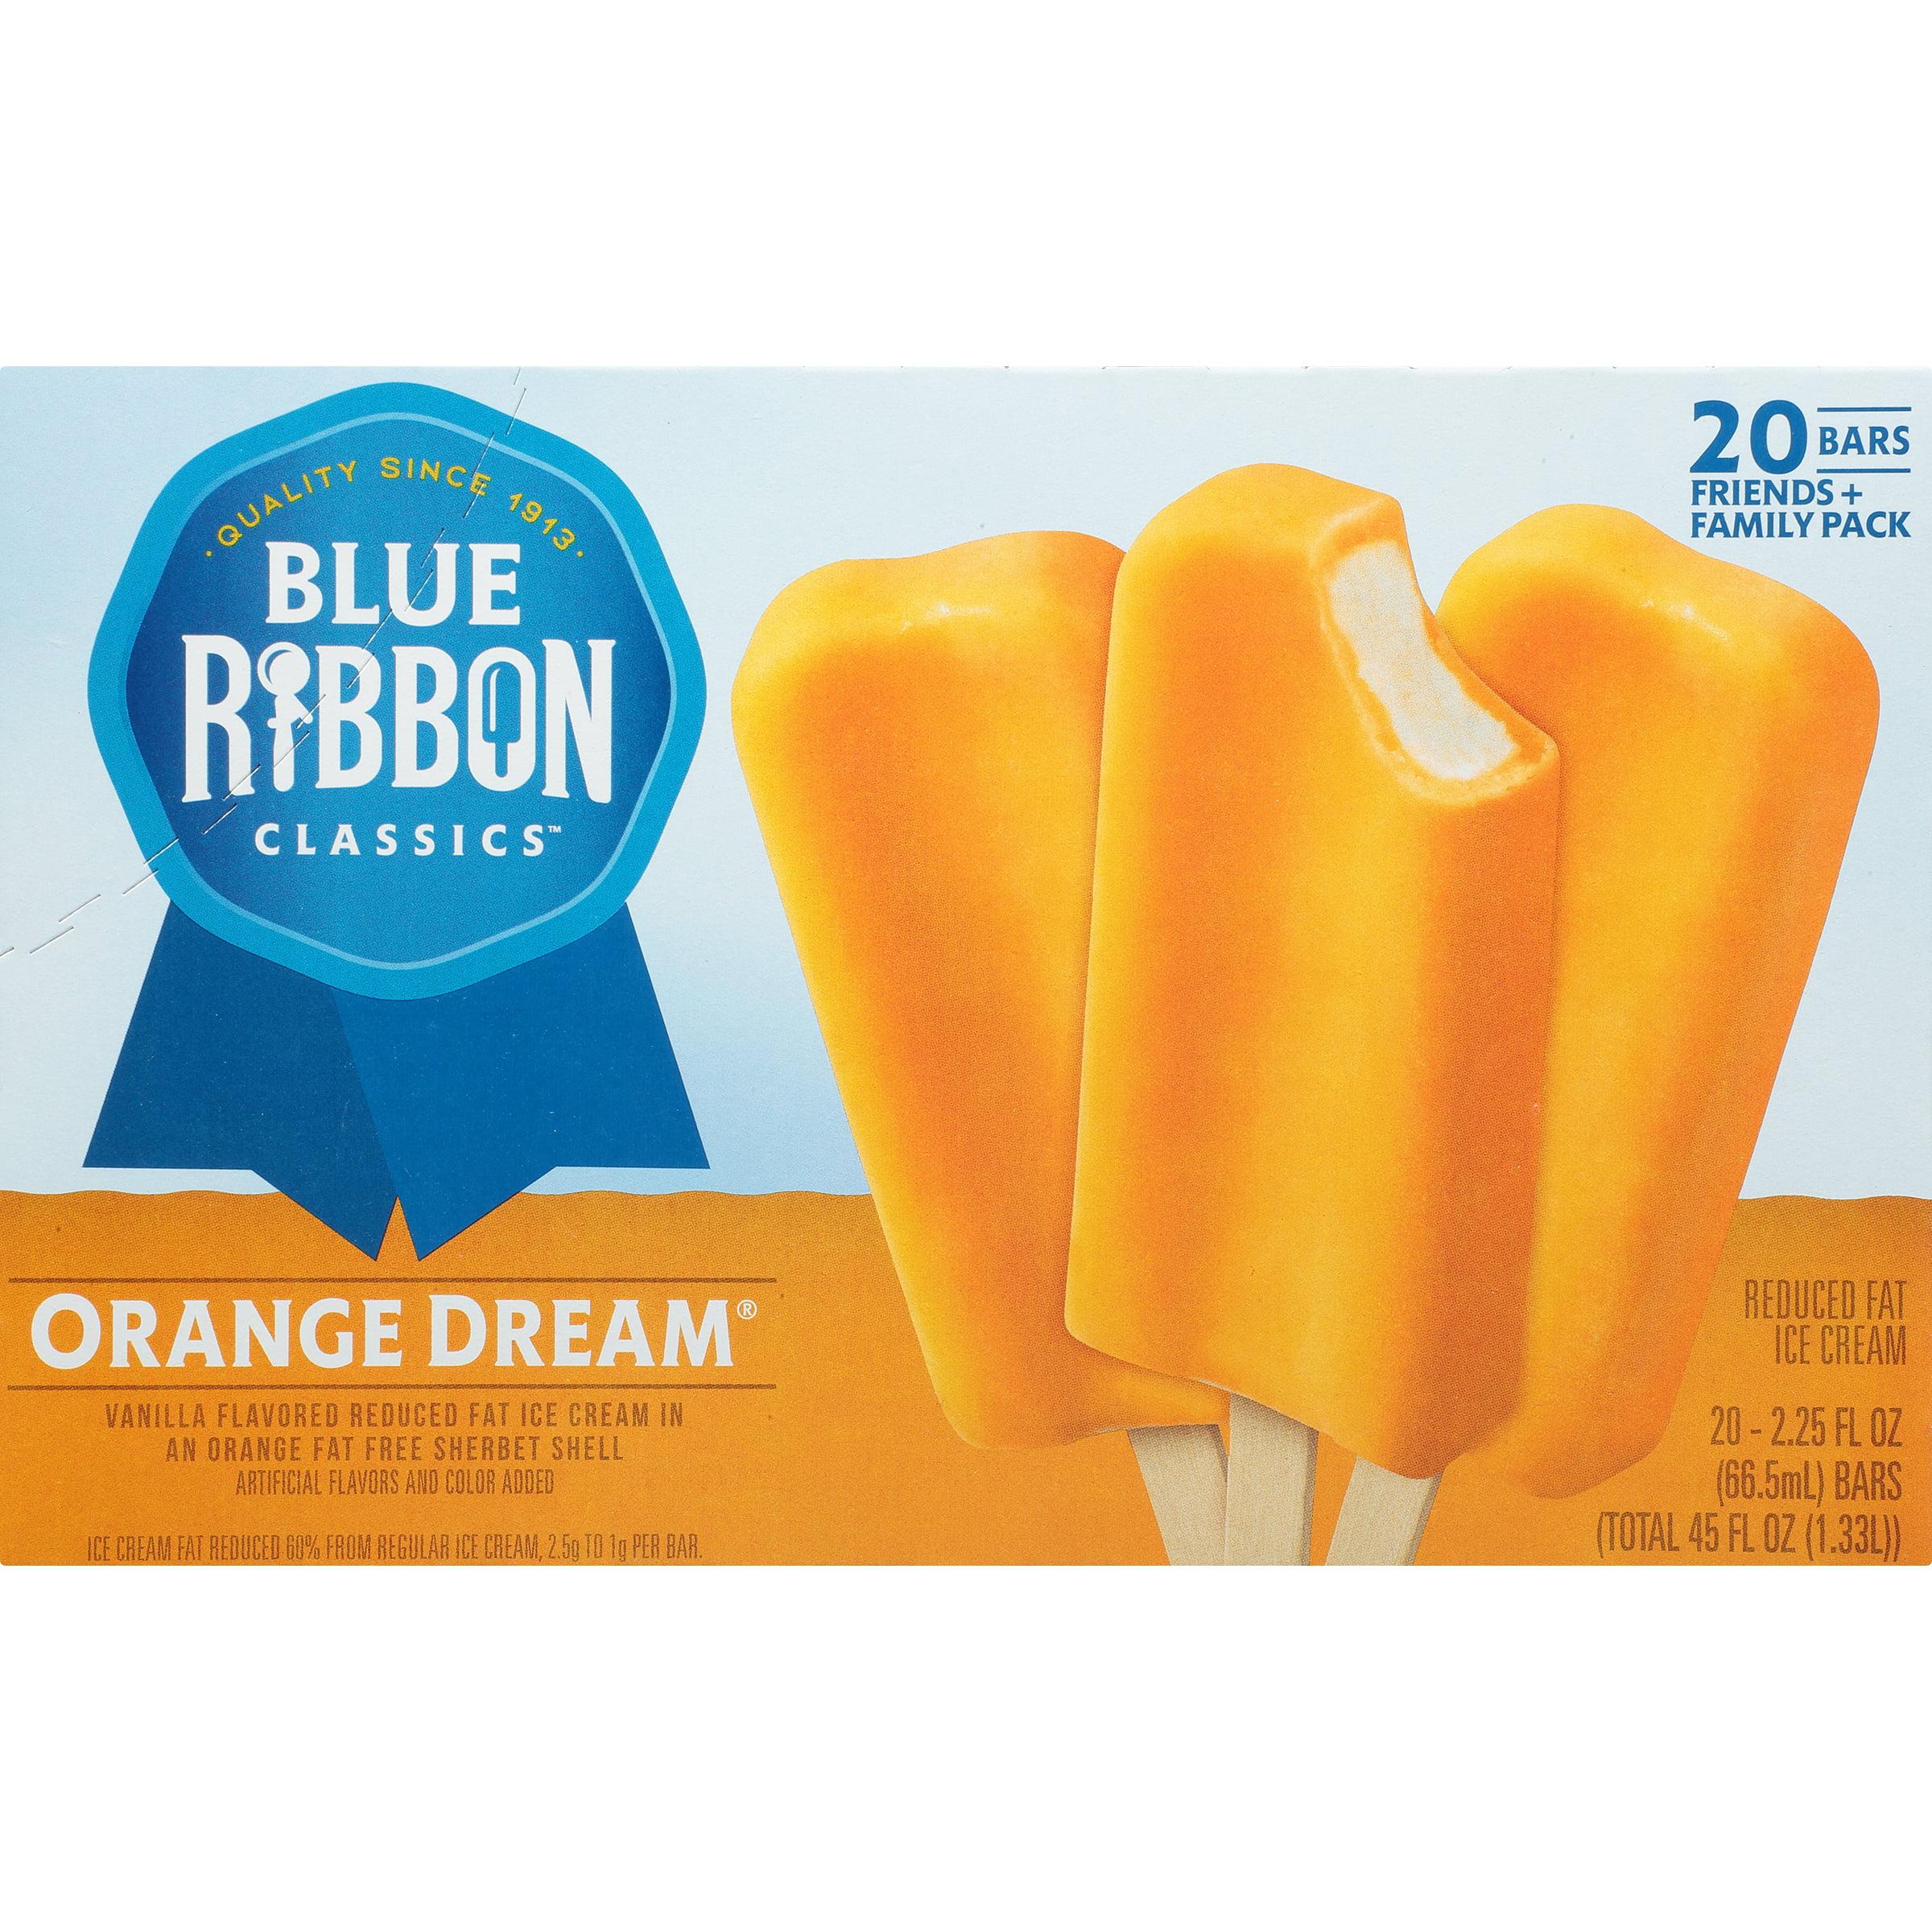 Blue Ribbon Classics Orange Dream Bar 20pk 2.25 fl oz